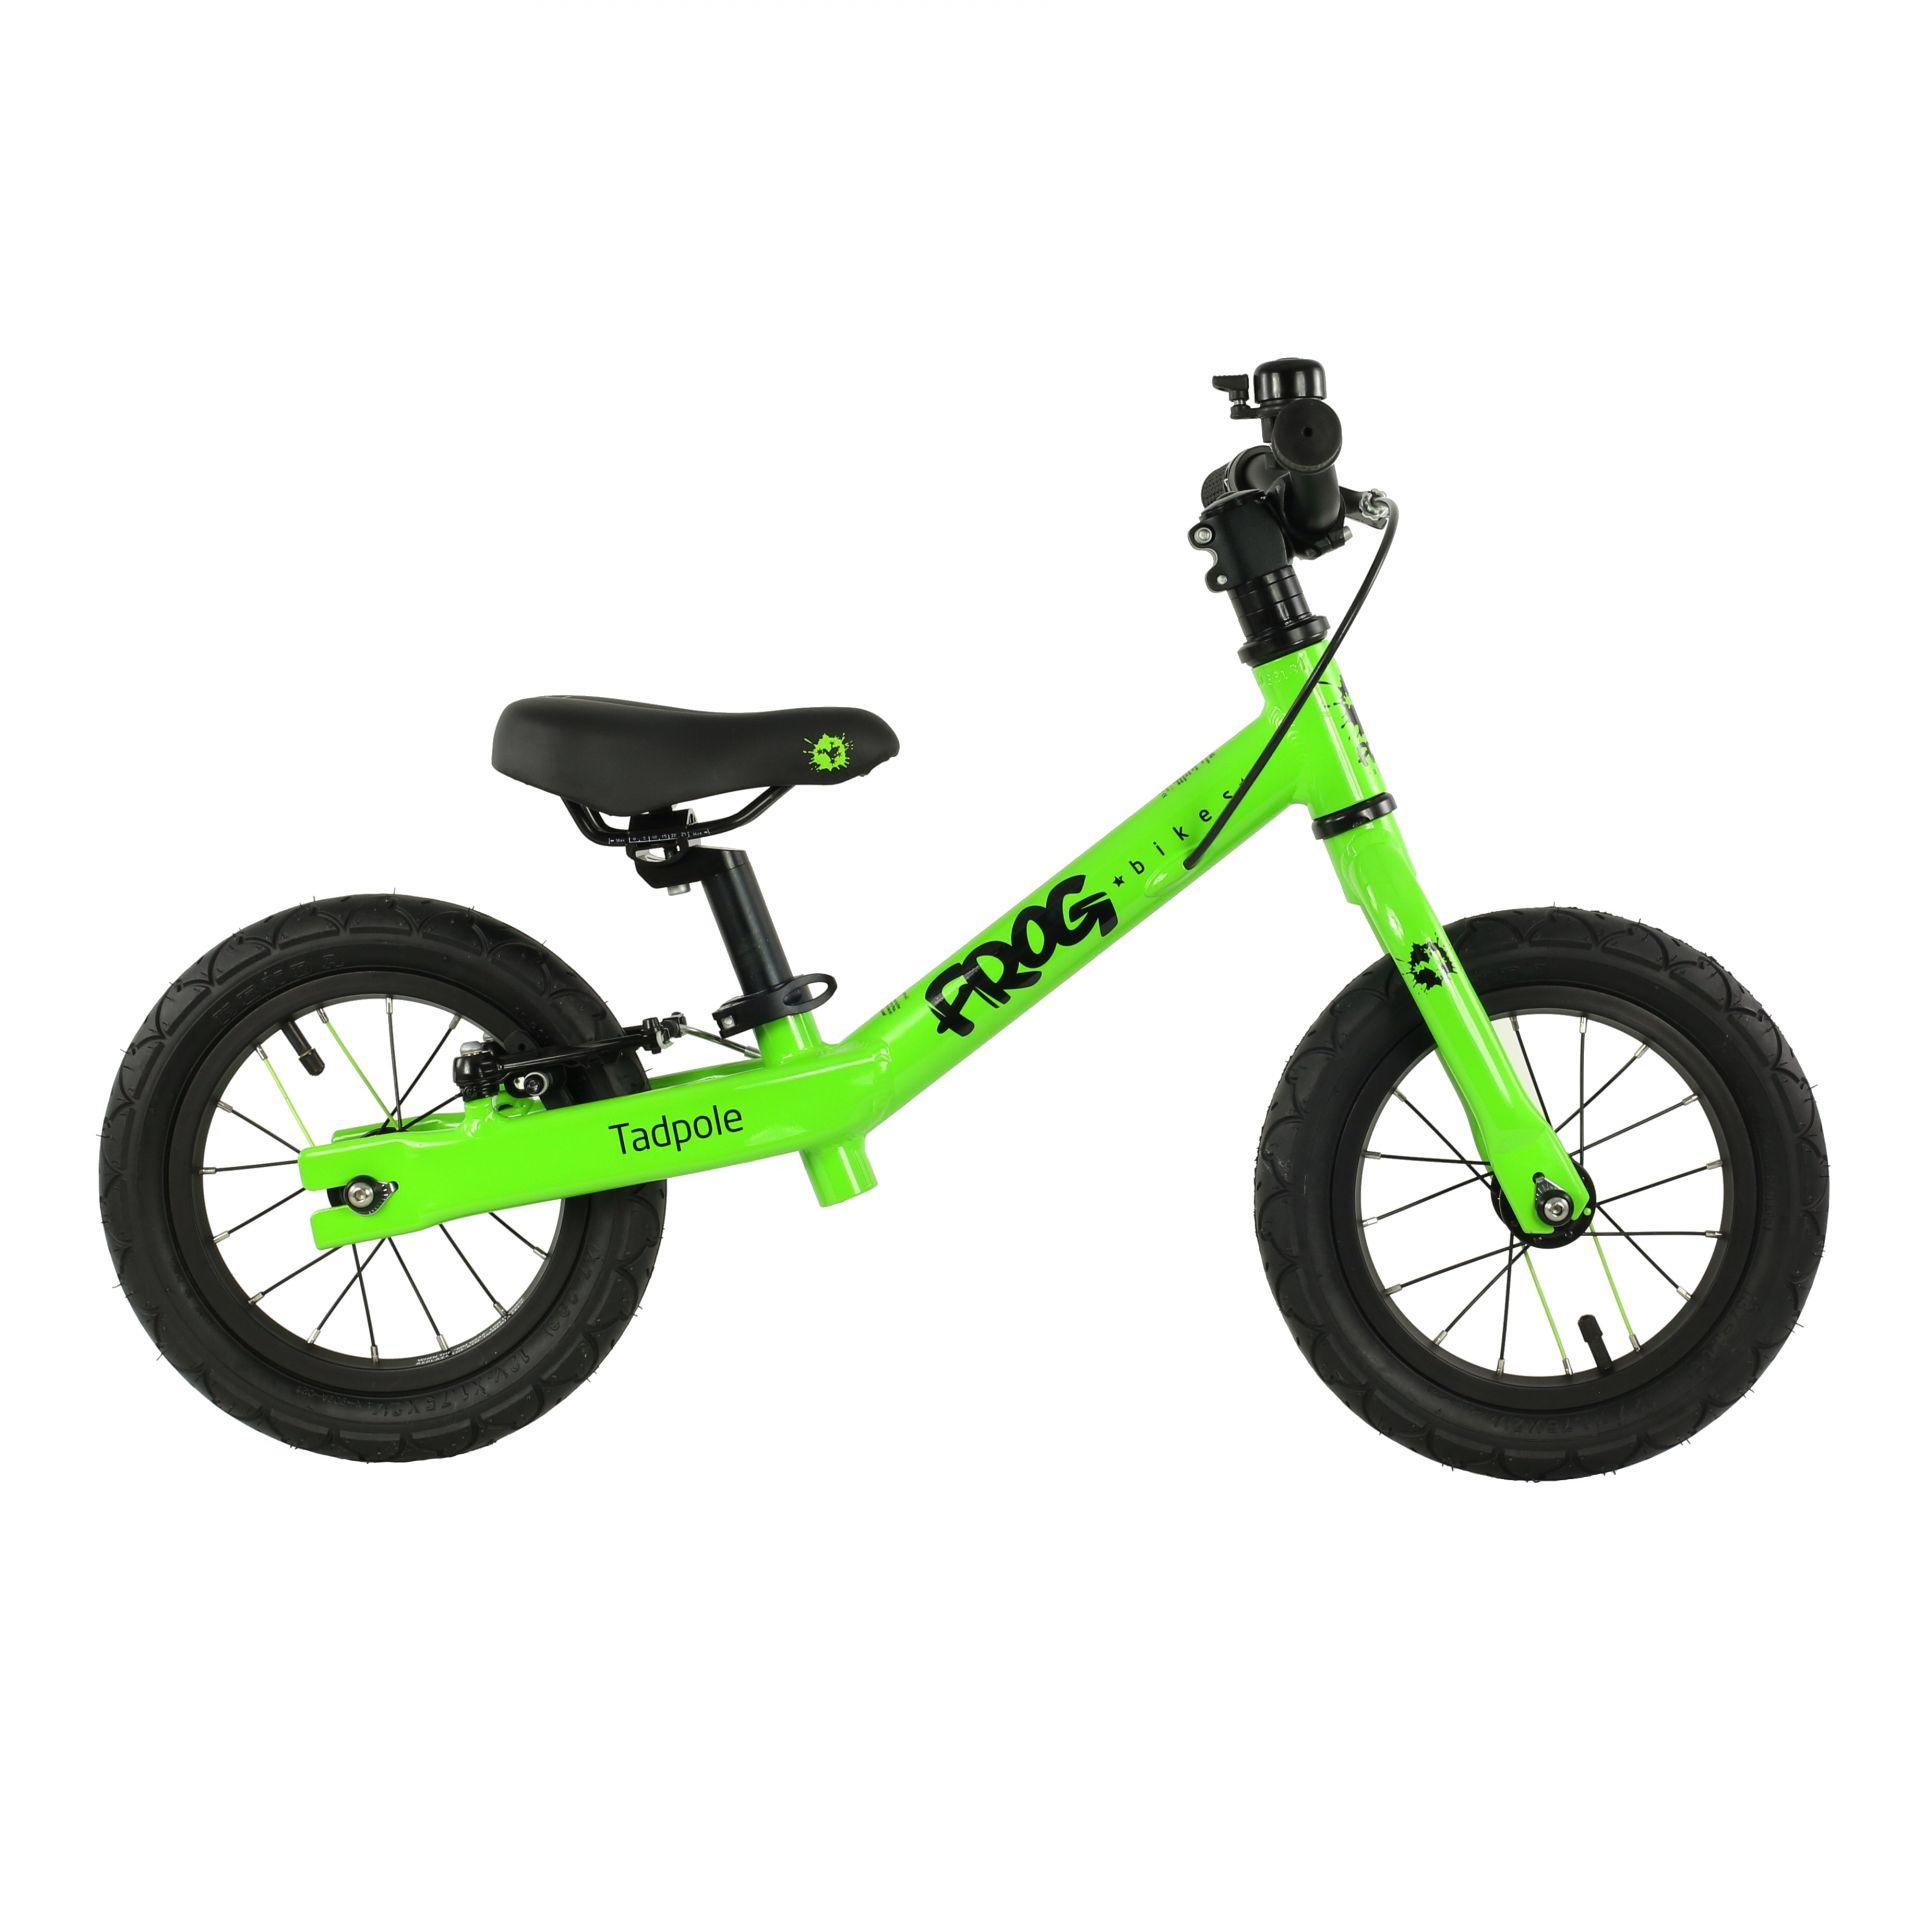 Draisienne Frog Bikes Tadpole 12\